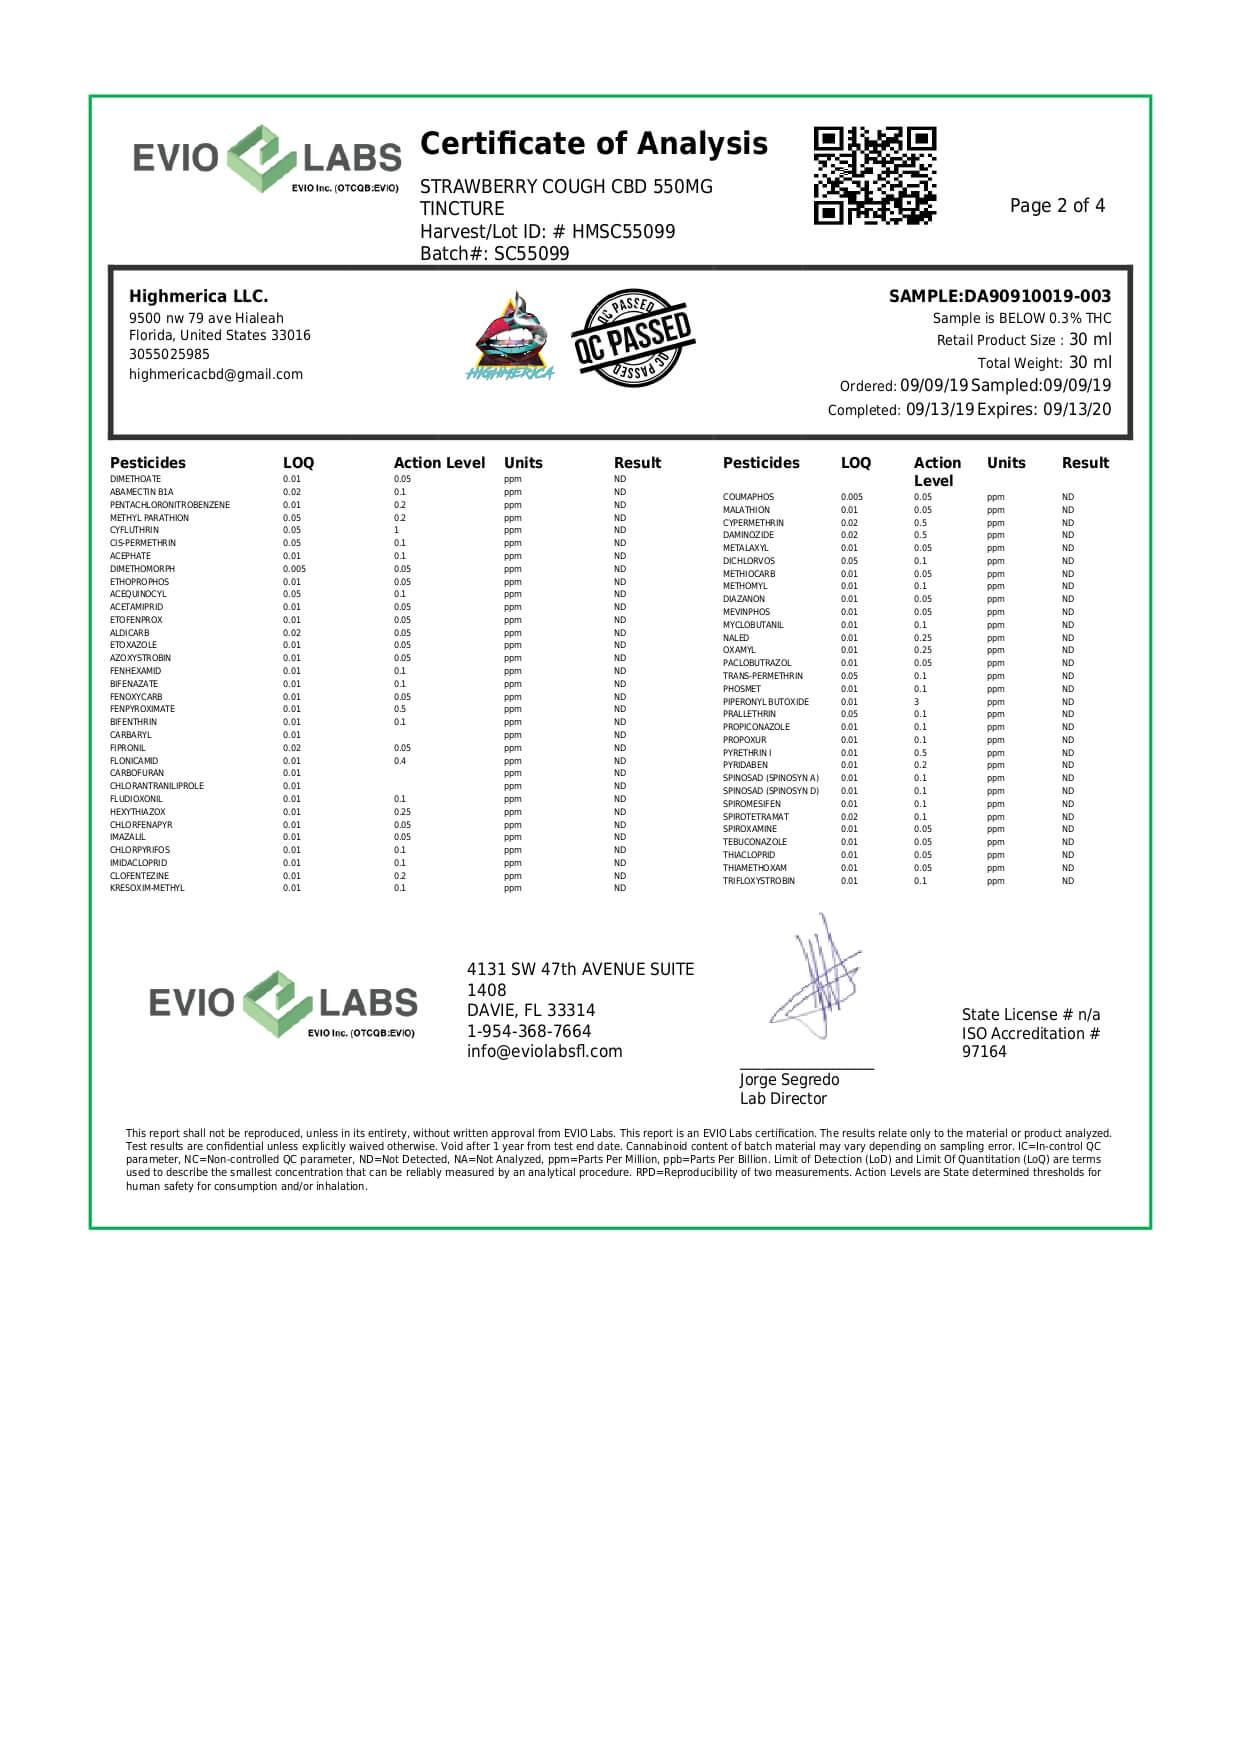 Highmerica CBD Terpenes Oil Strawberry Cough Lab Report